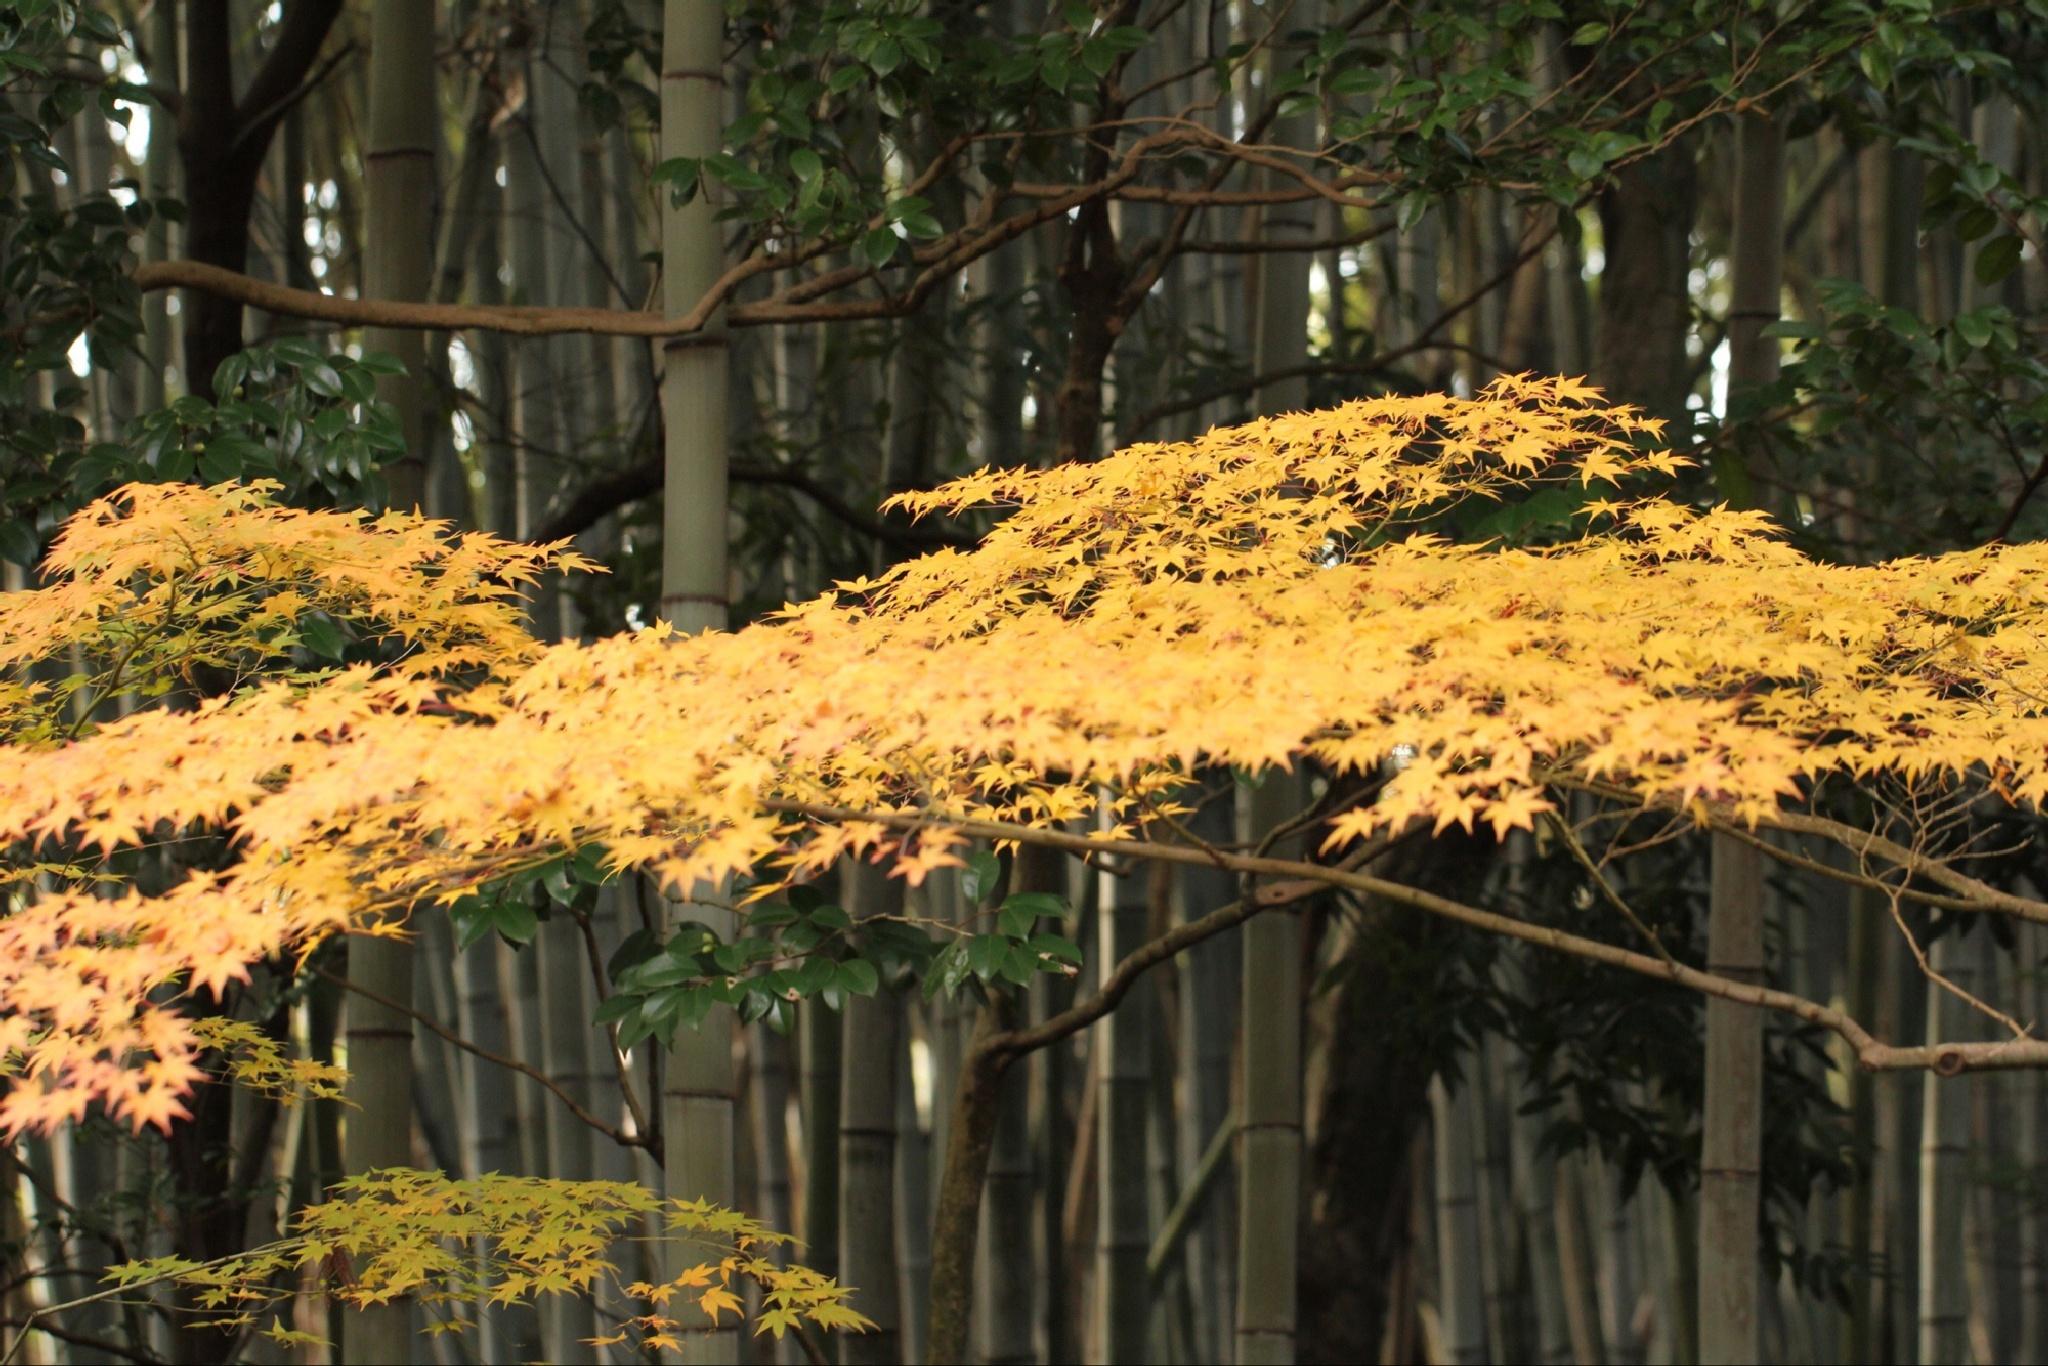 Autumn in Japan by Brian Rudder